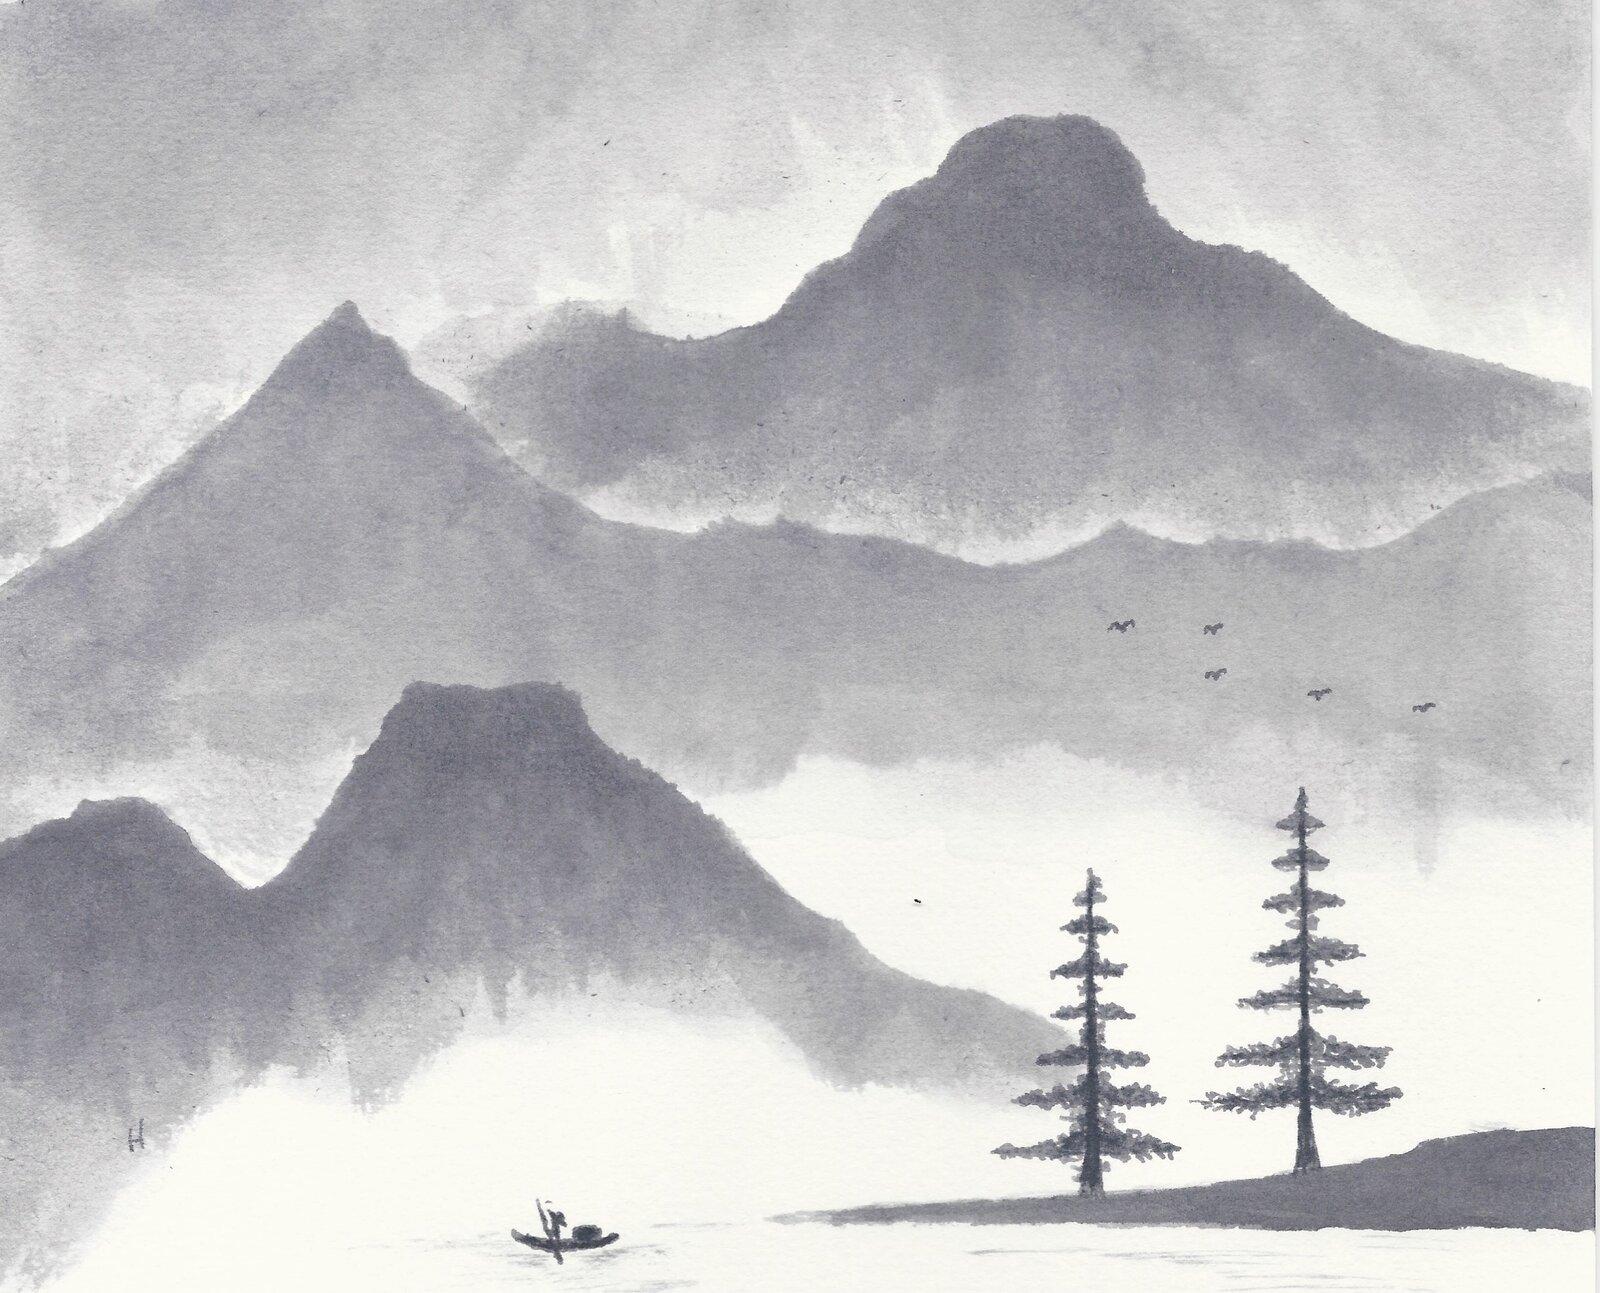 j herbin - gris nuage - inkxperiment 300ppi.jpg